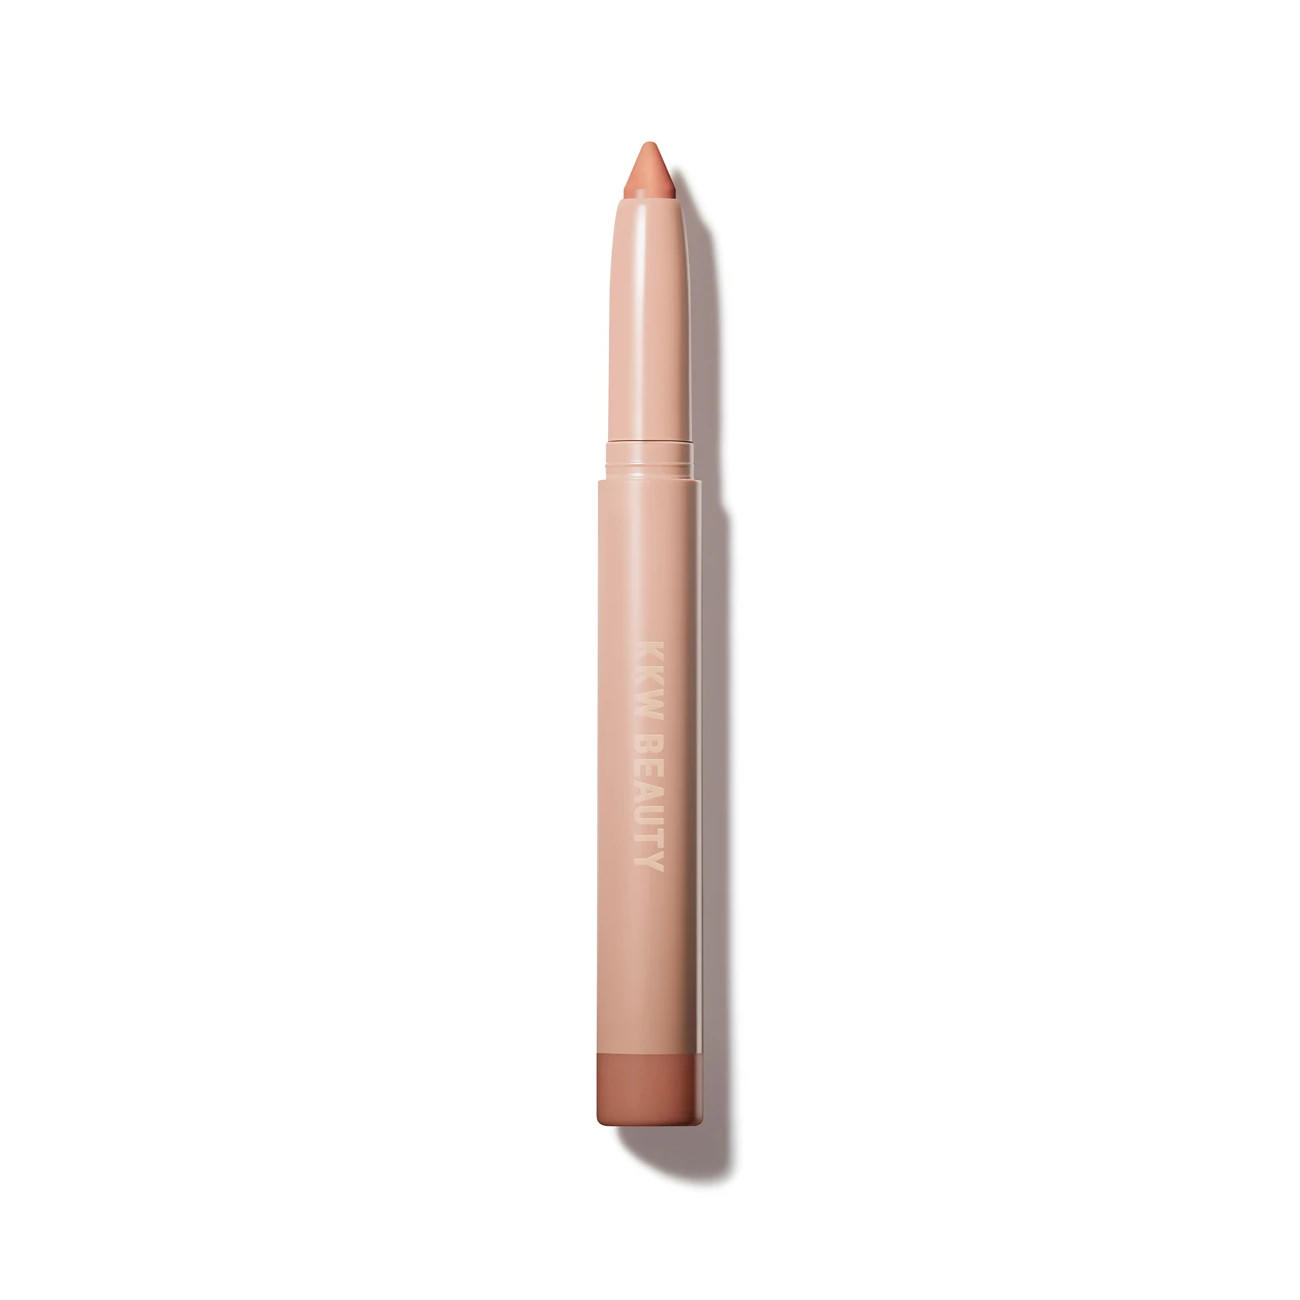 KKW Beauty Lip Crayon Dreamy Peach